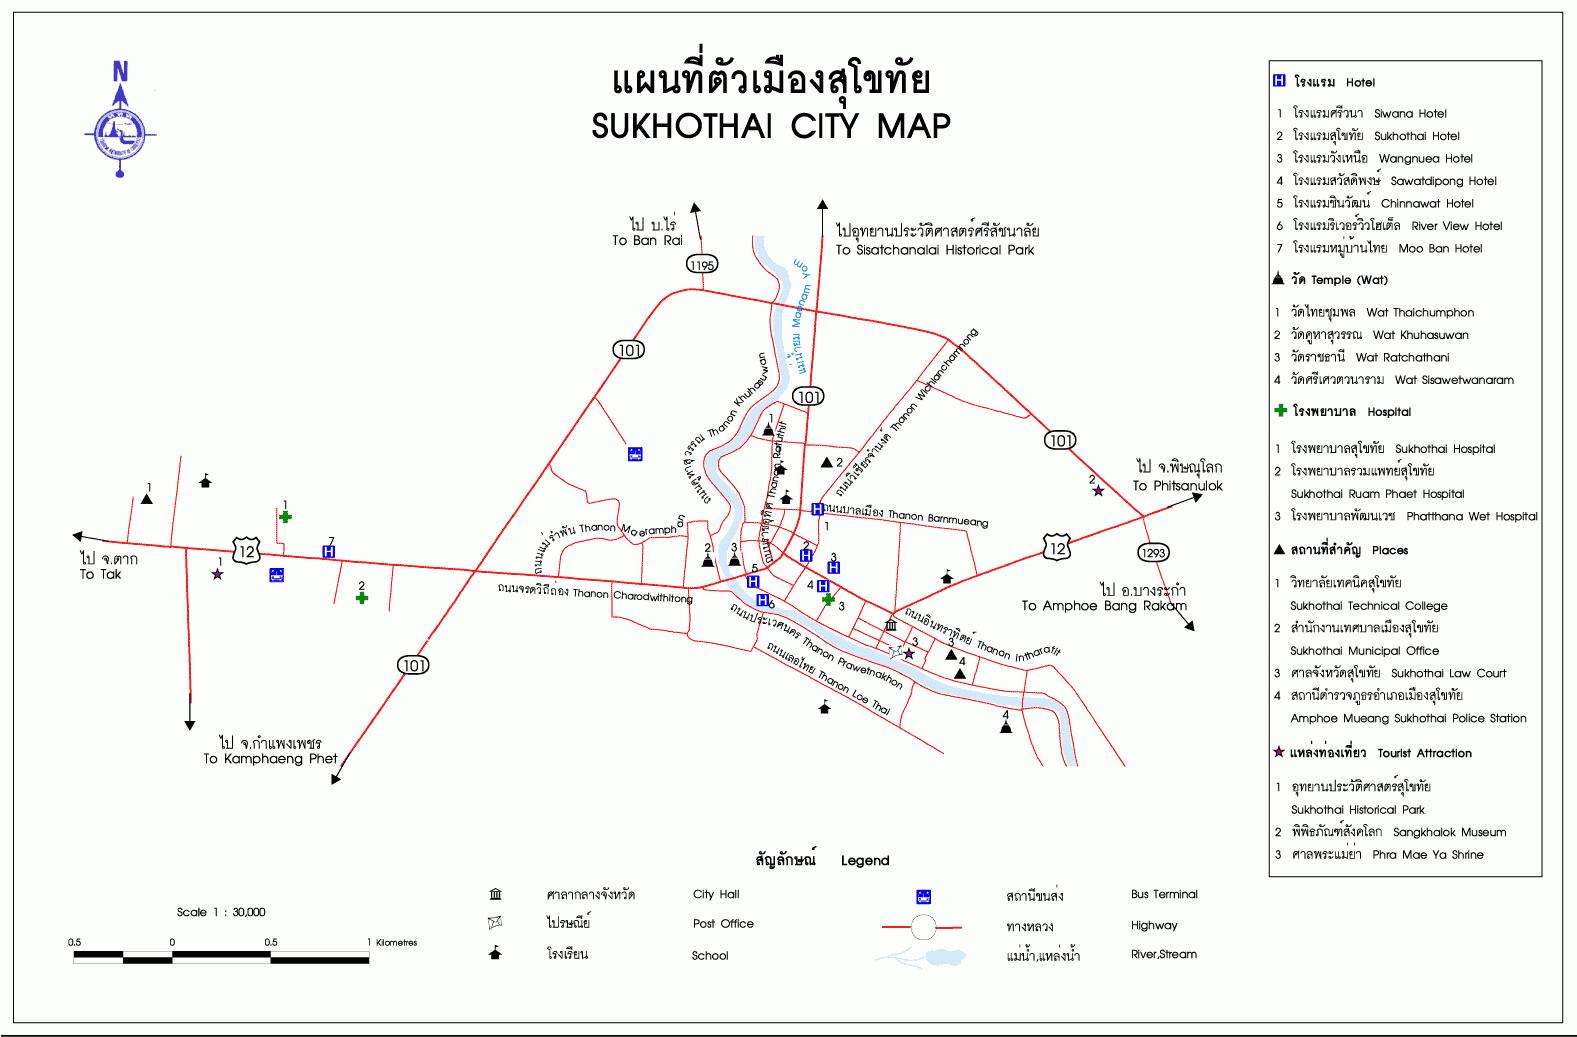 Carte Thailande Sukhothai.Forum Thailande